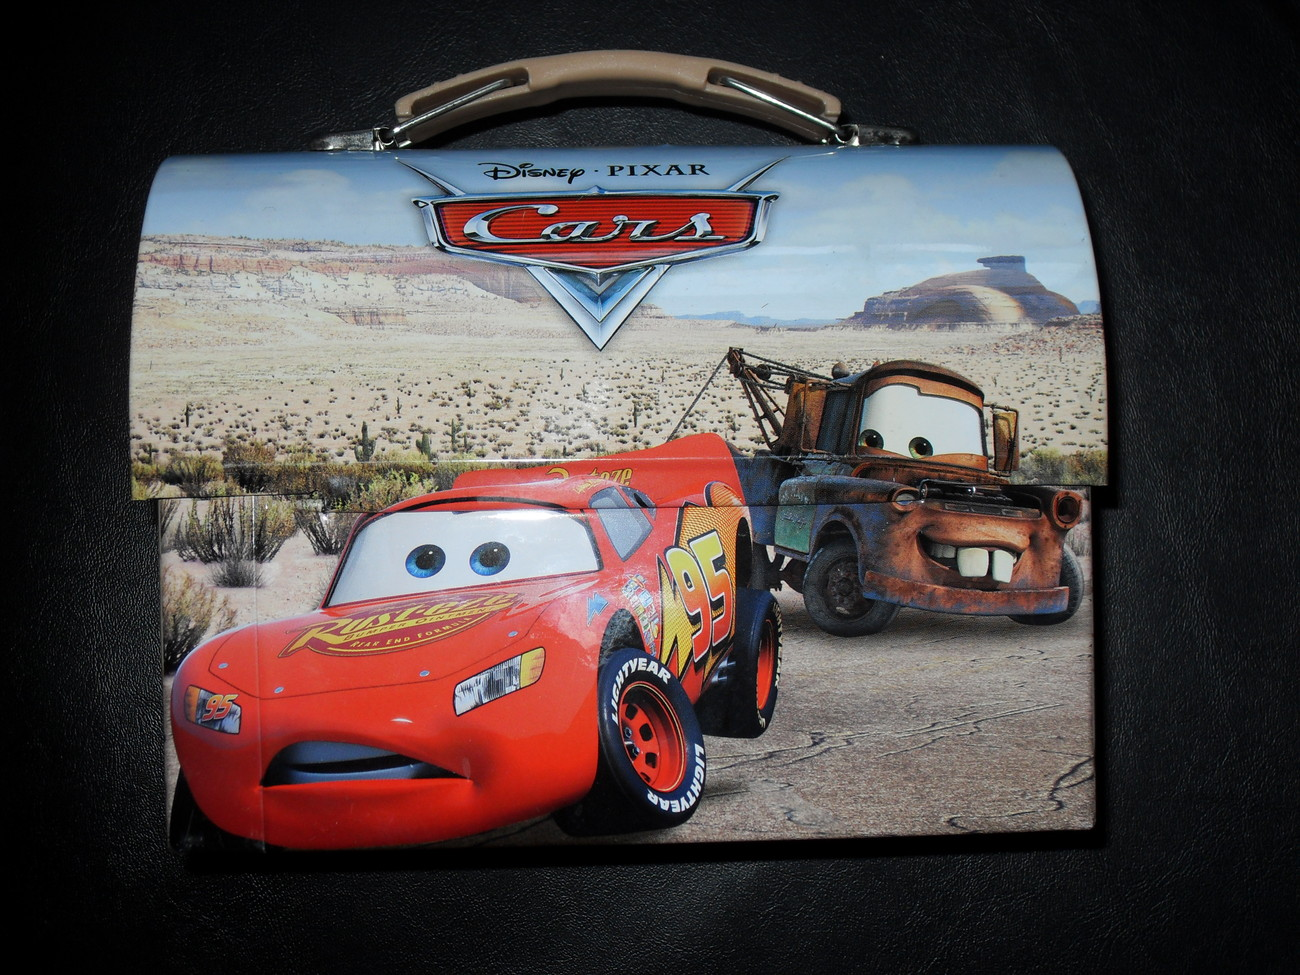 Disney Pixar Cars Tin Box